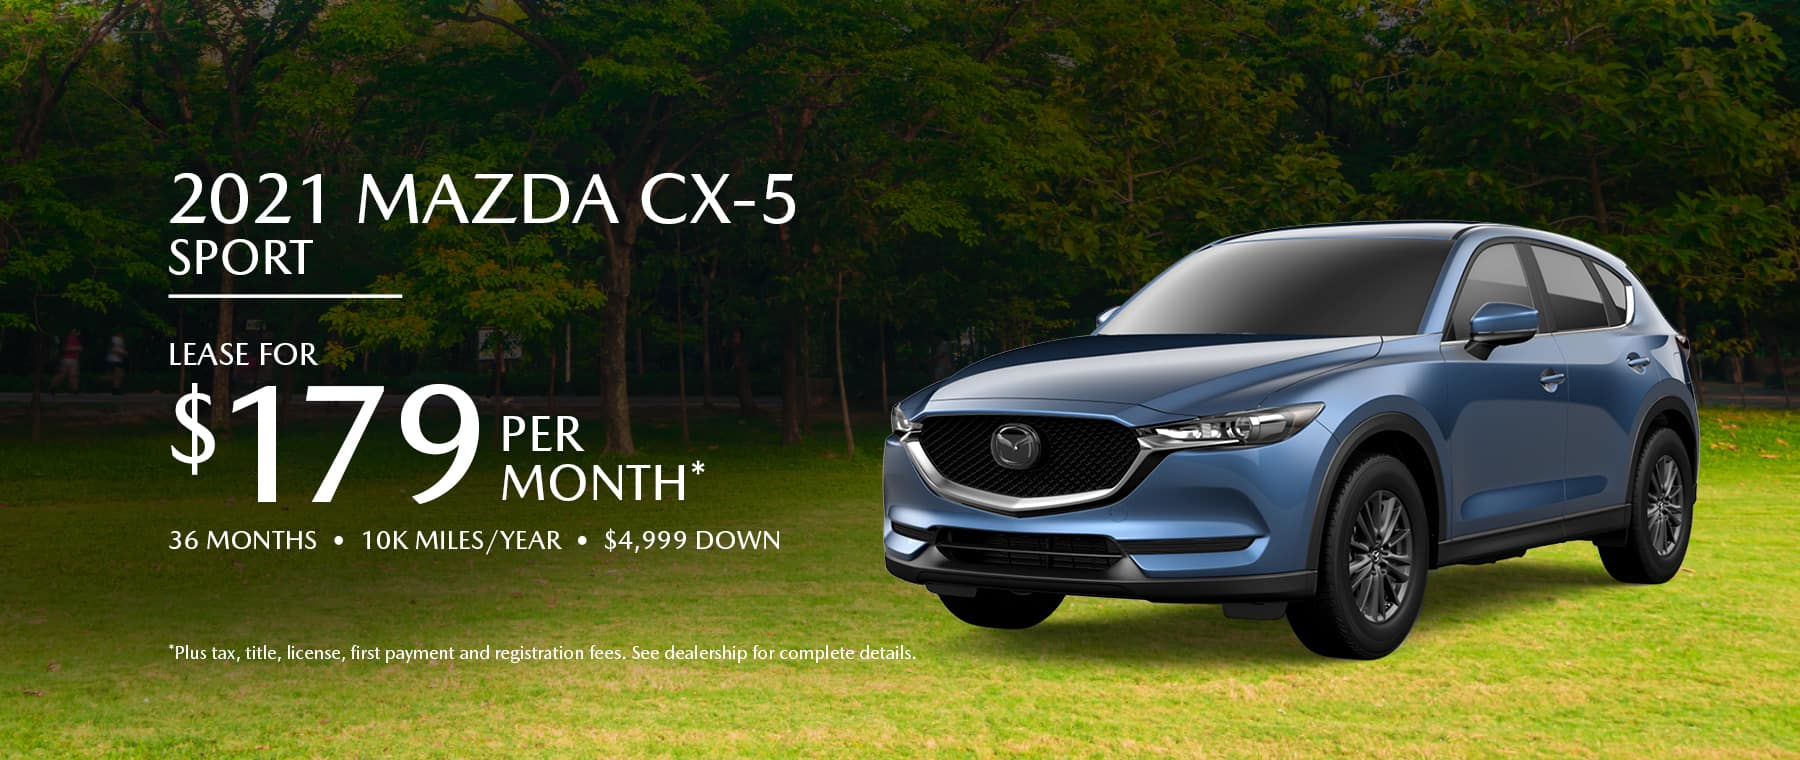 2021 Mazda CX-5 Header